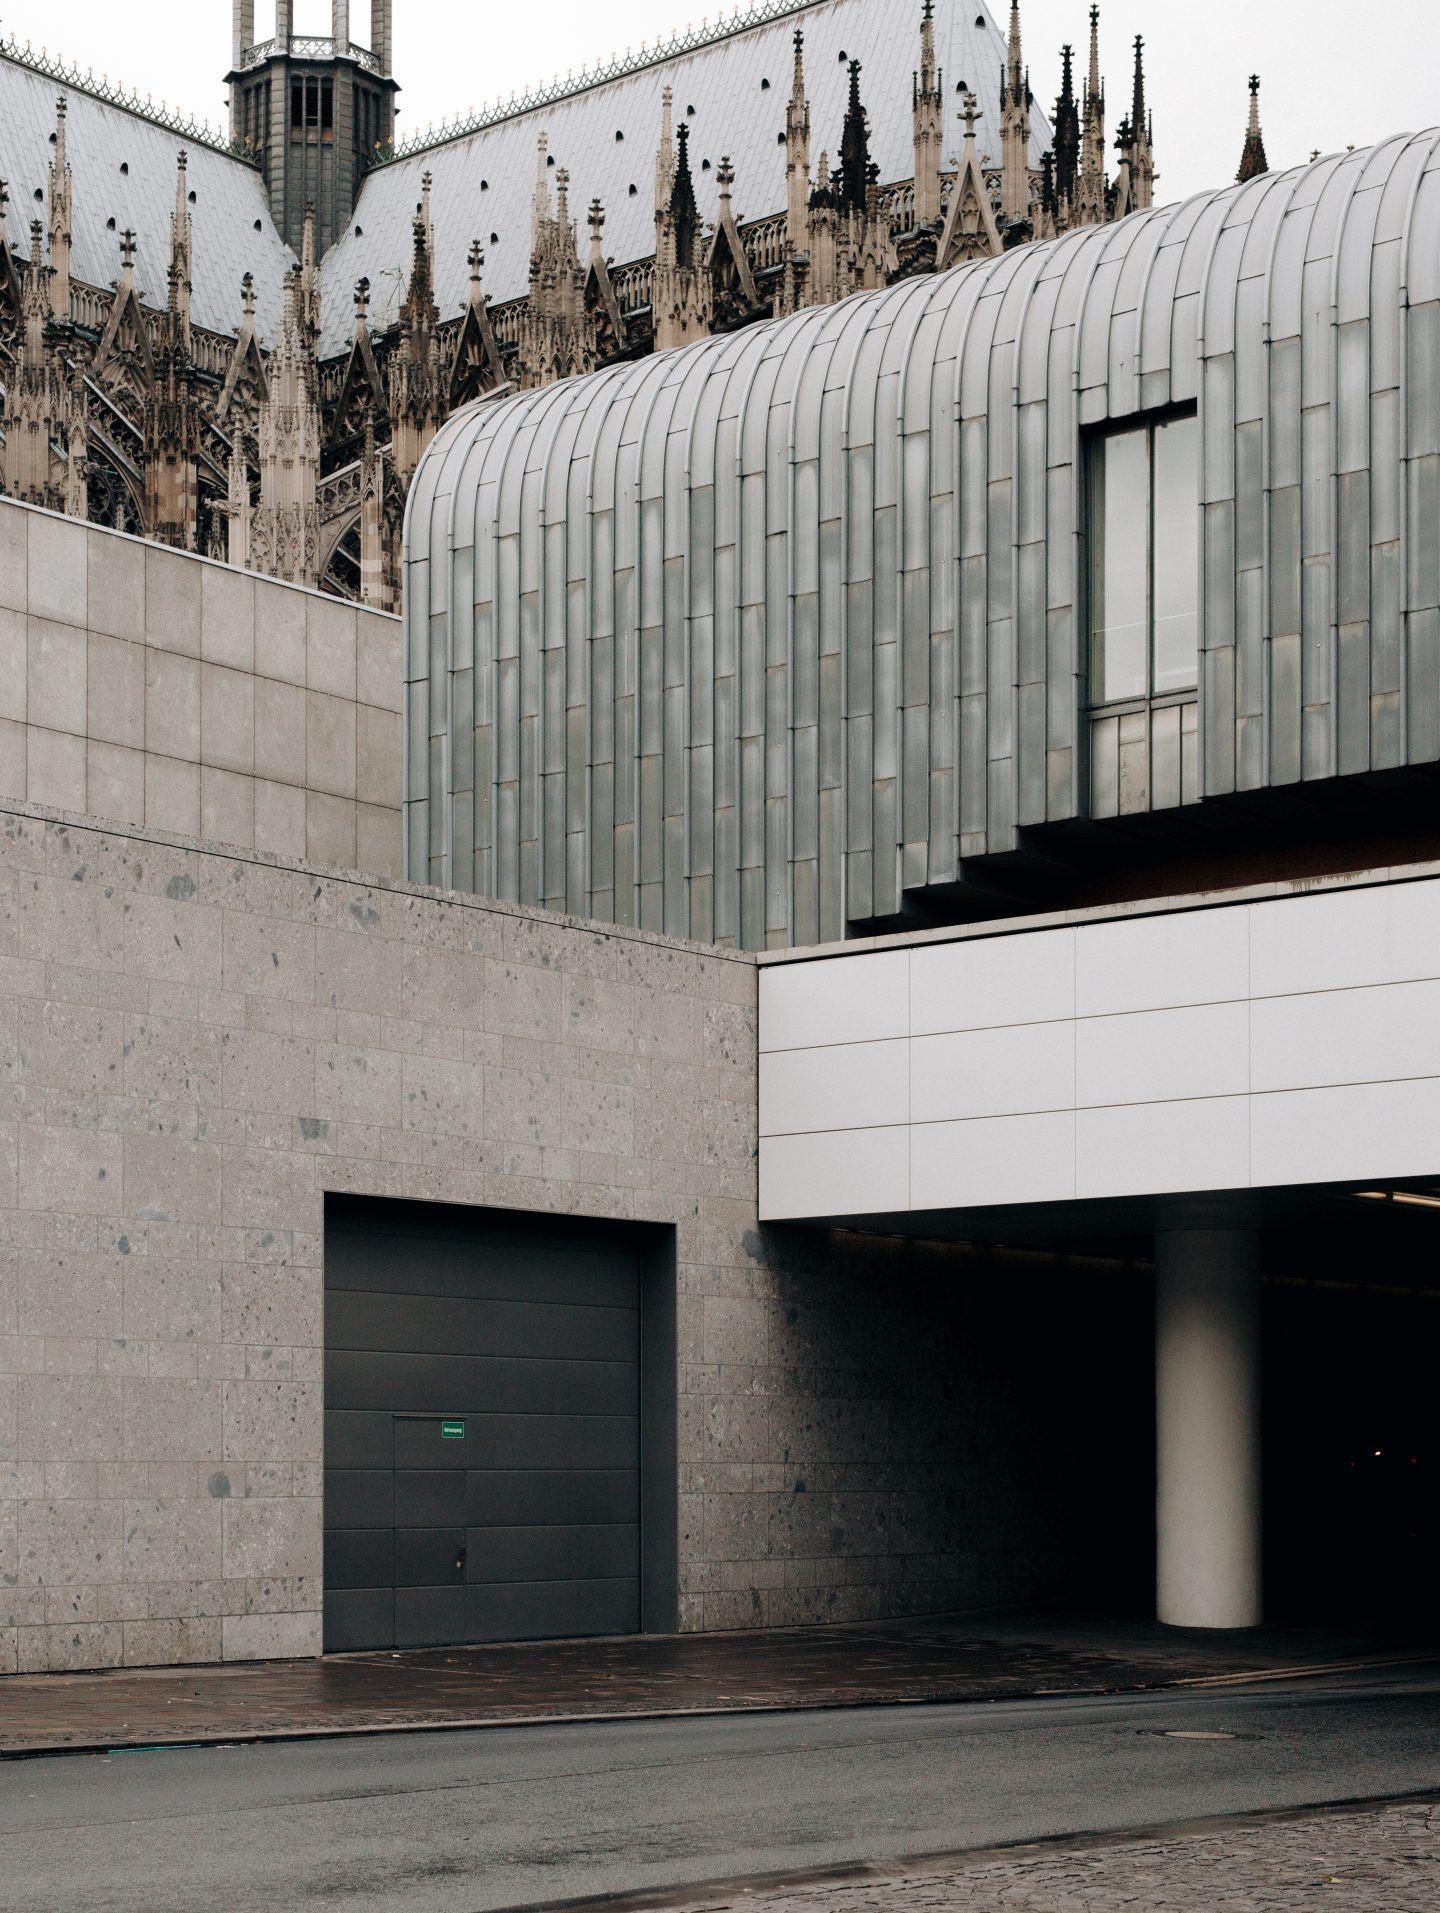 ignant-design-thomas-pirot-wade-guyton-museum-ludwig-3